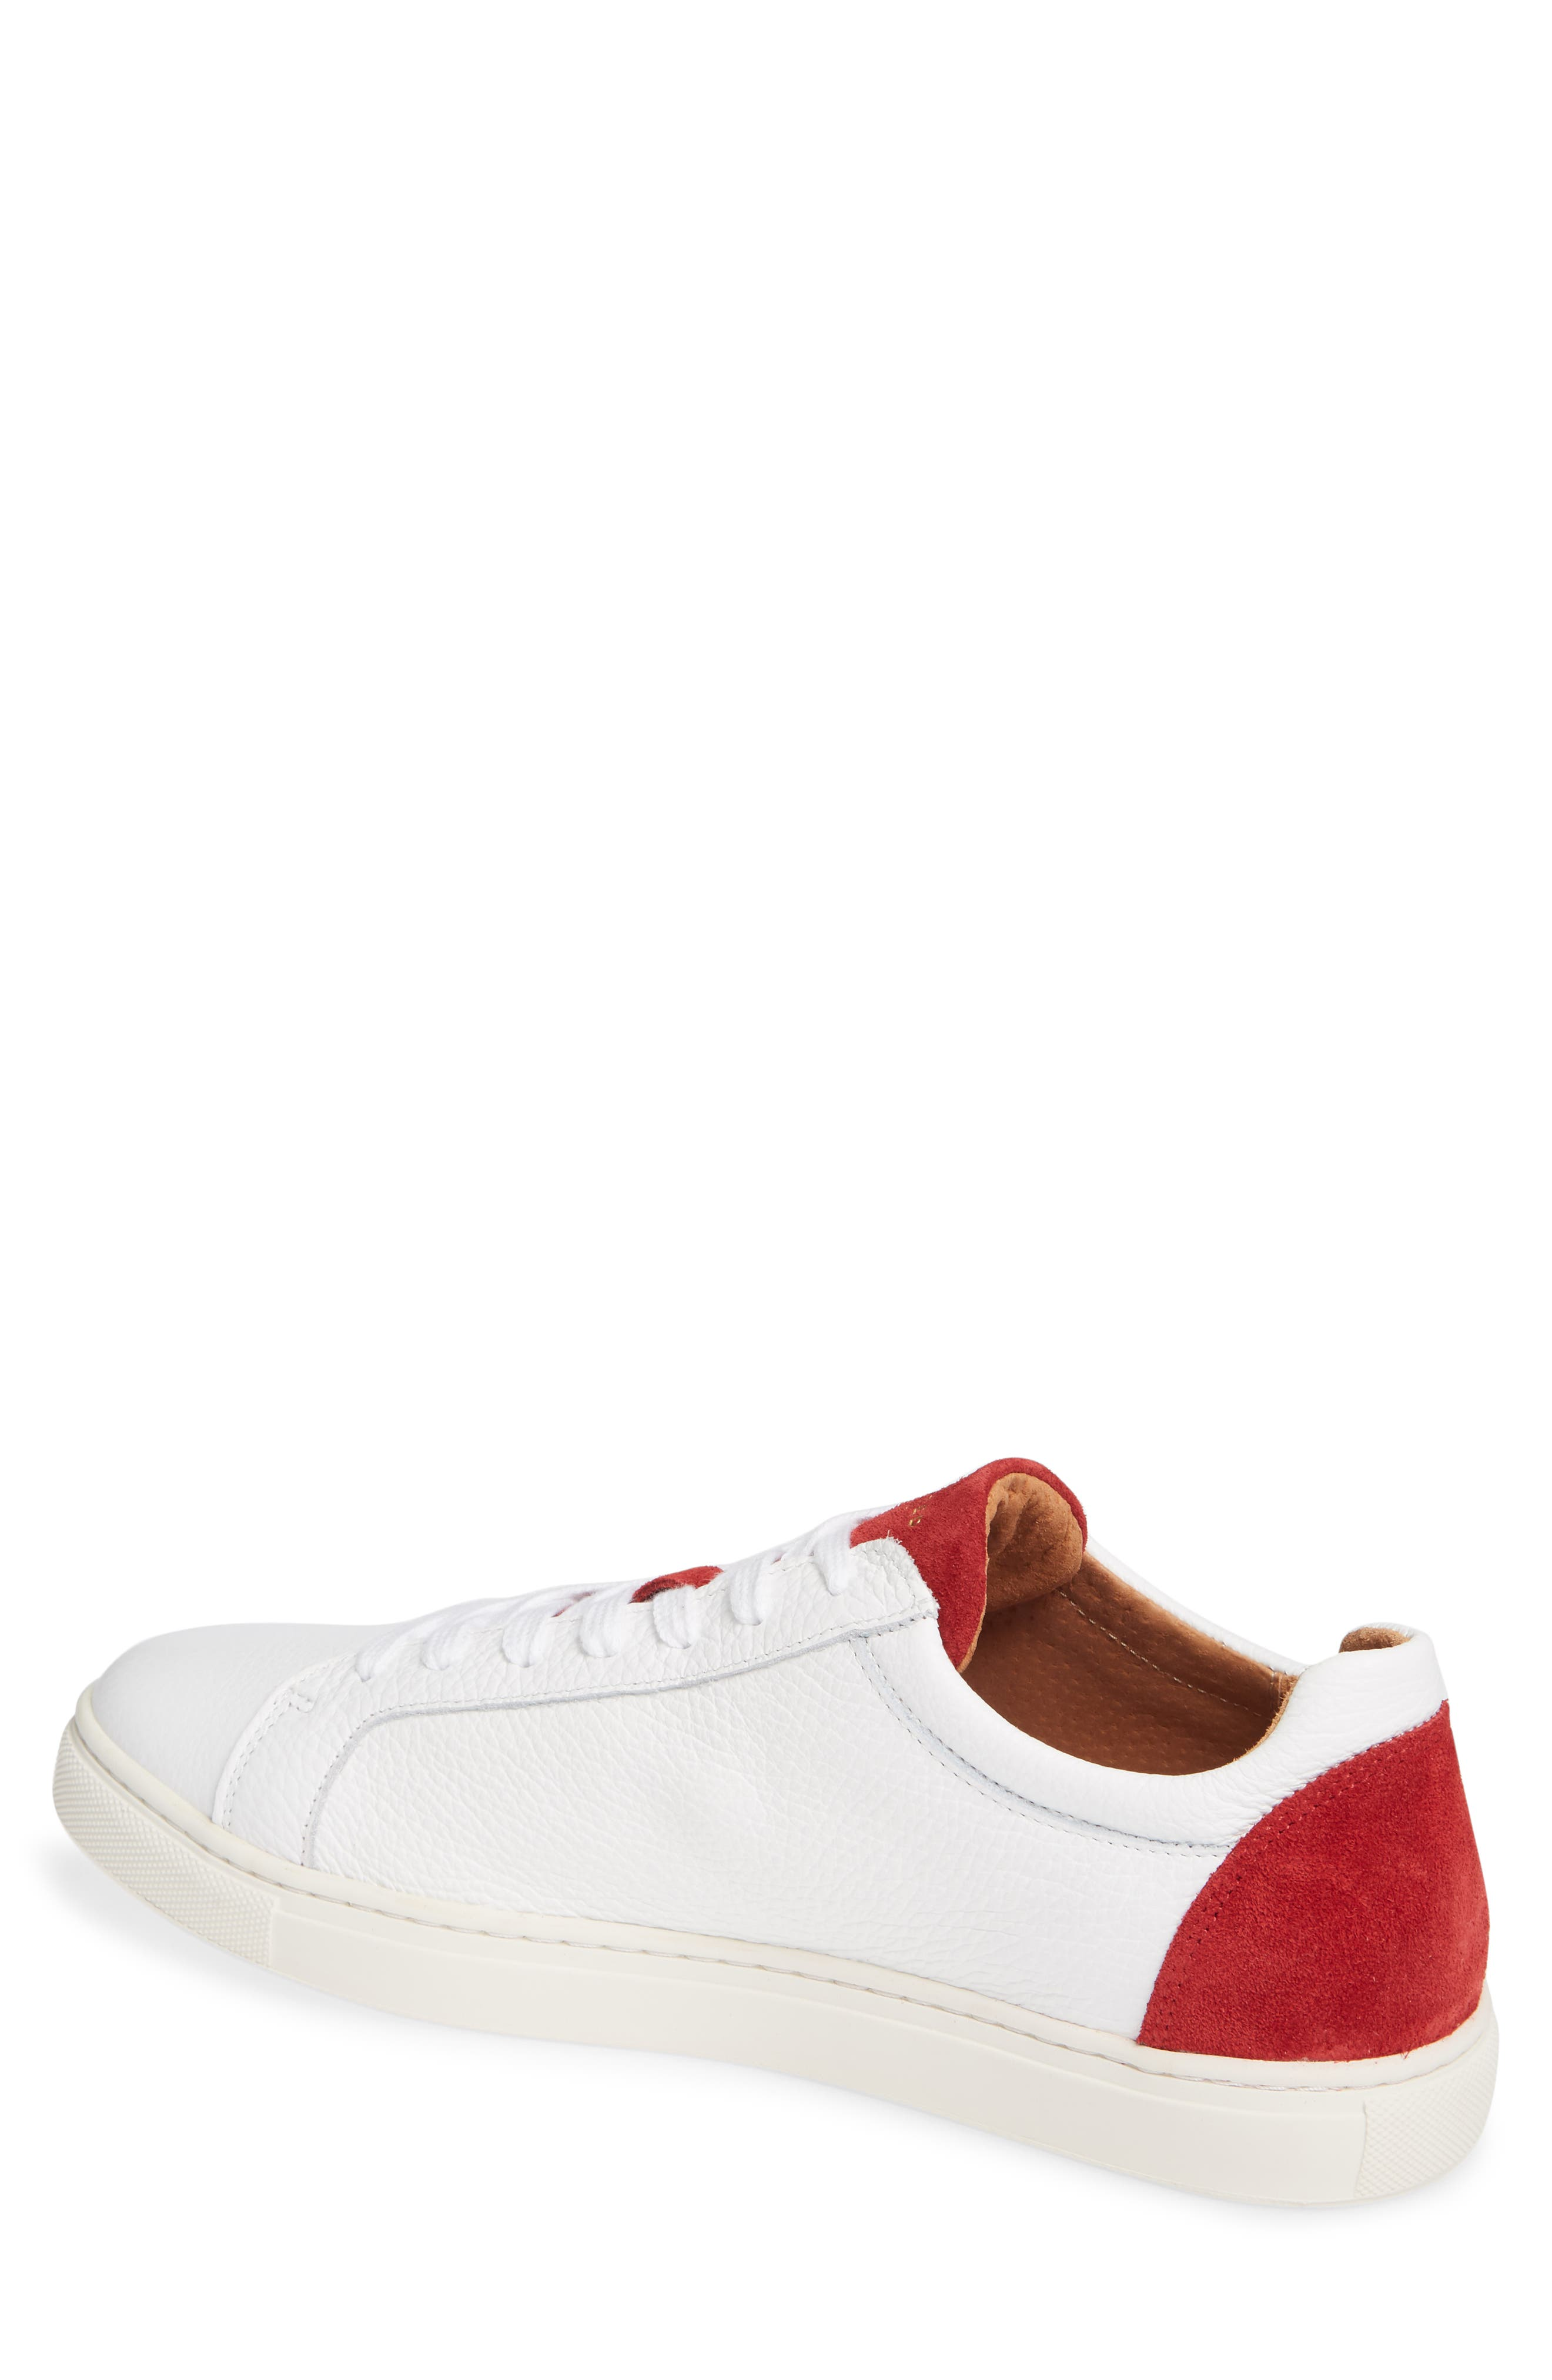 David Colorblock Sneaker,                             Alternate thumbnail 2, color,                             WHITE/ BARBADOS CHERRY